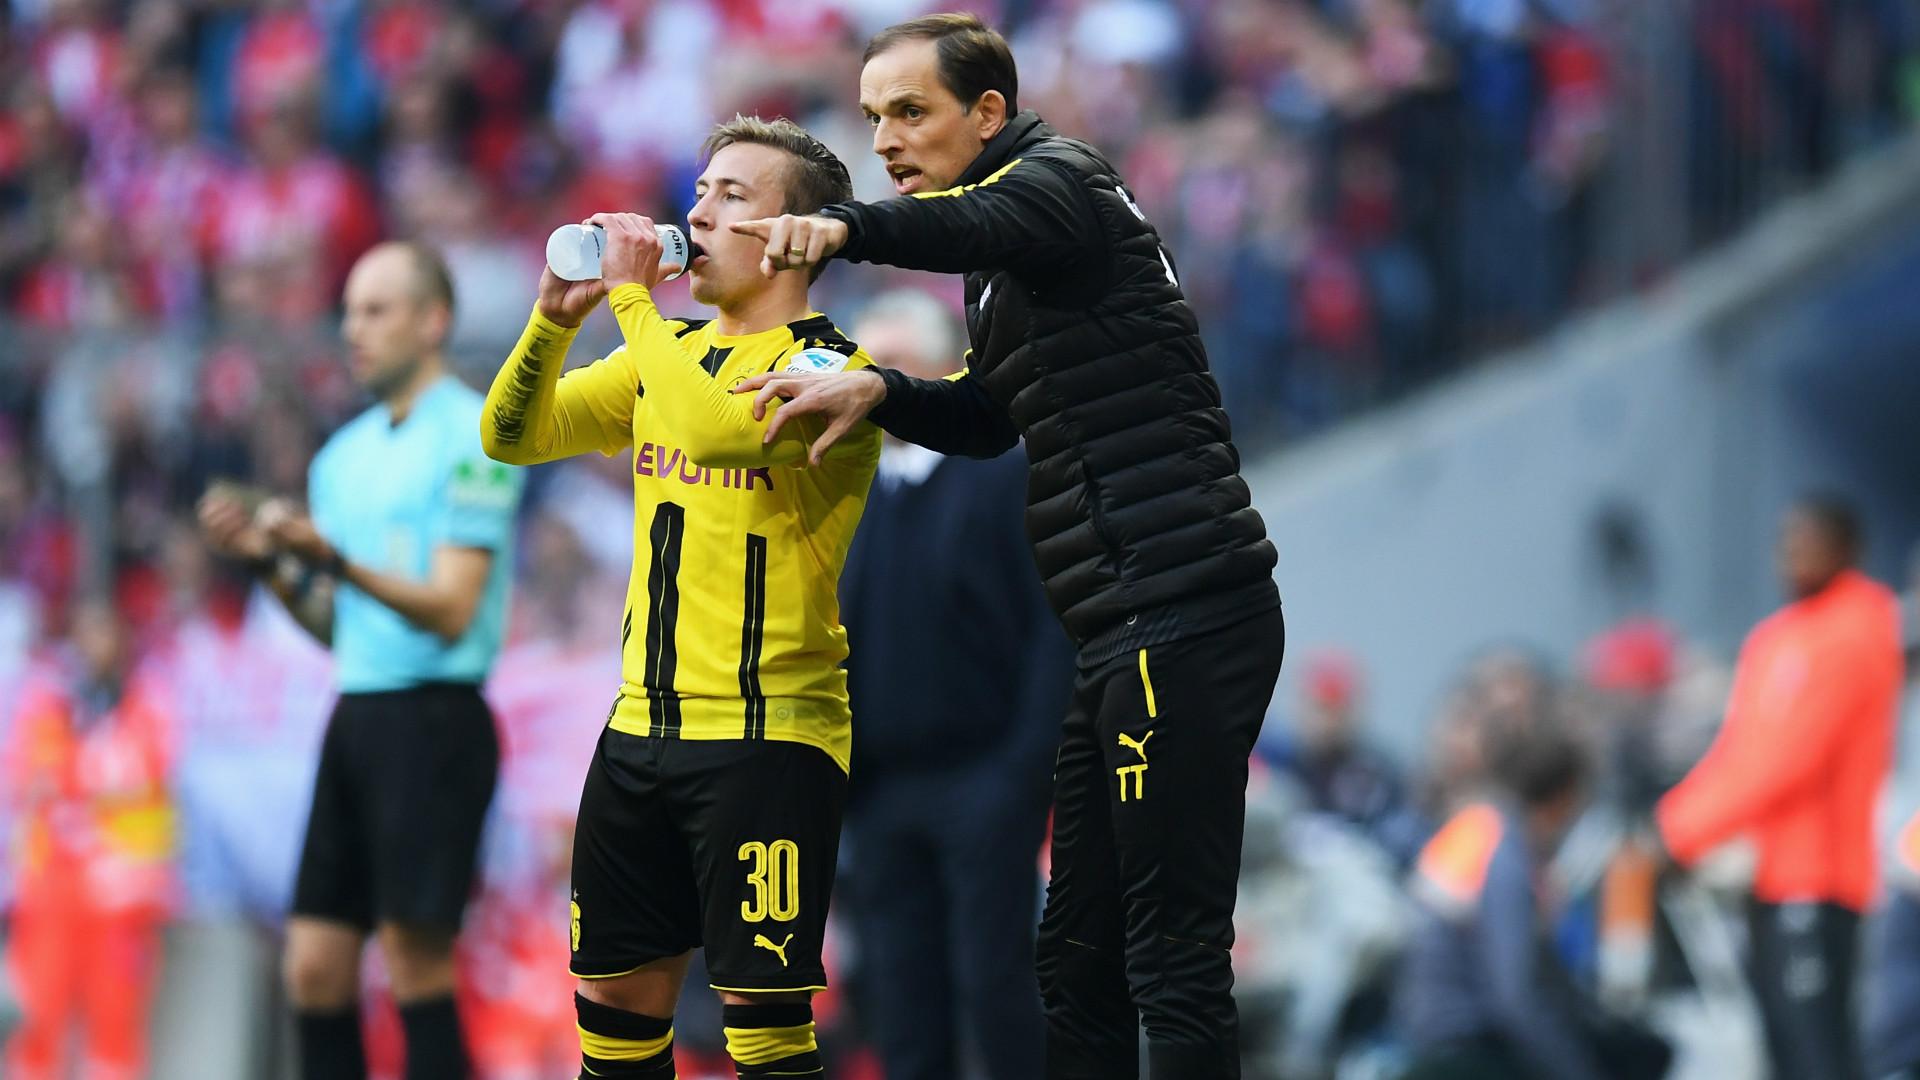 Felix Passlack Thomas Tuchel Borussia Dortmund 2017